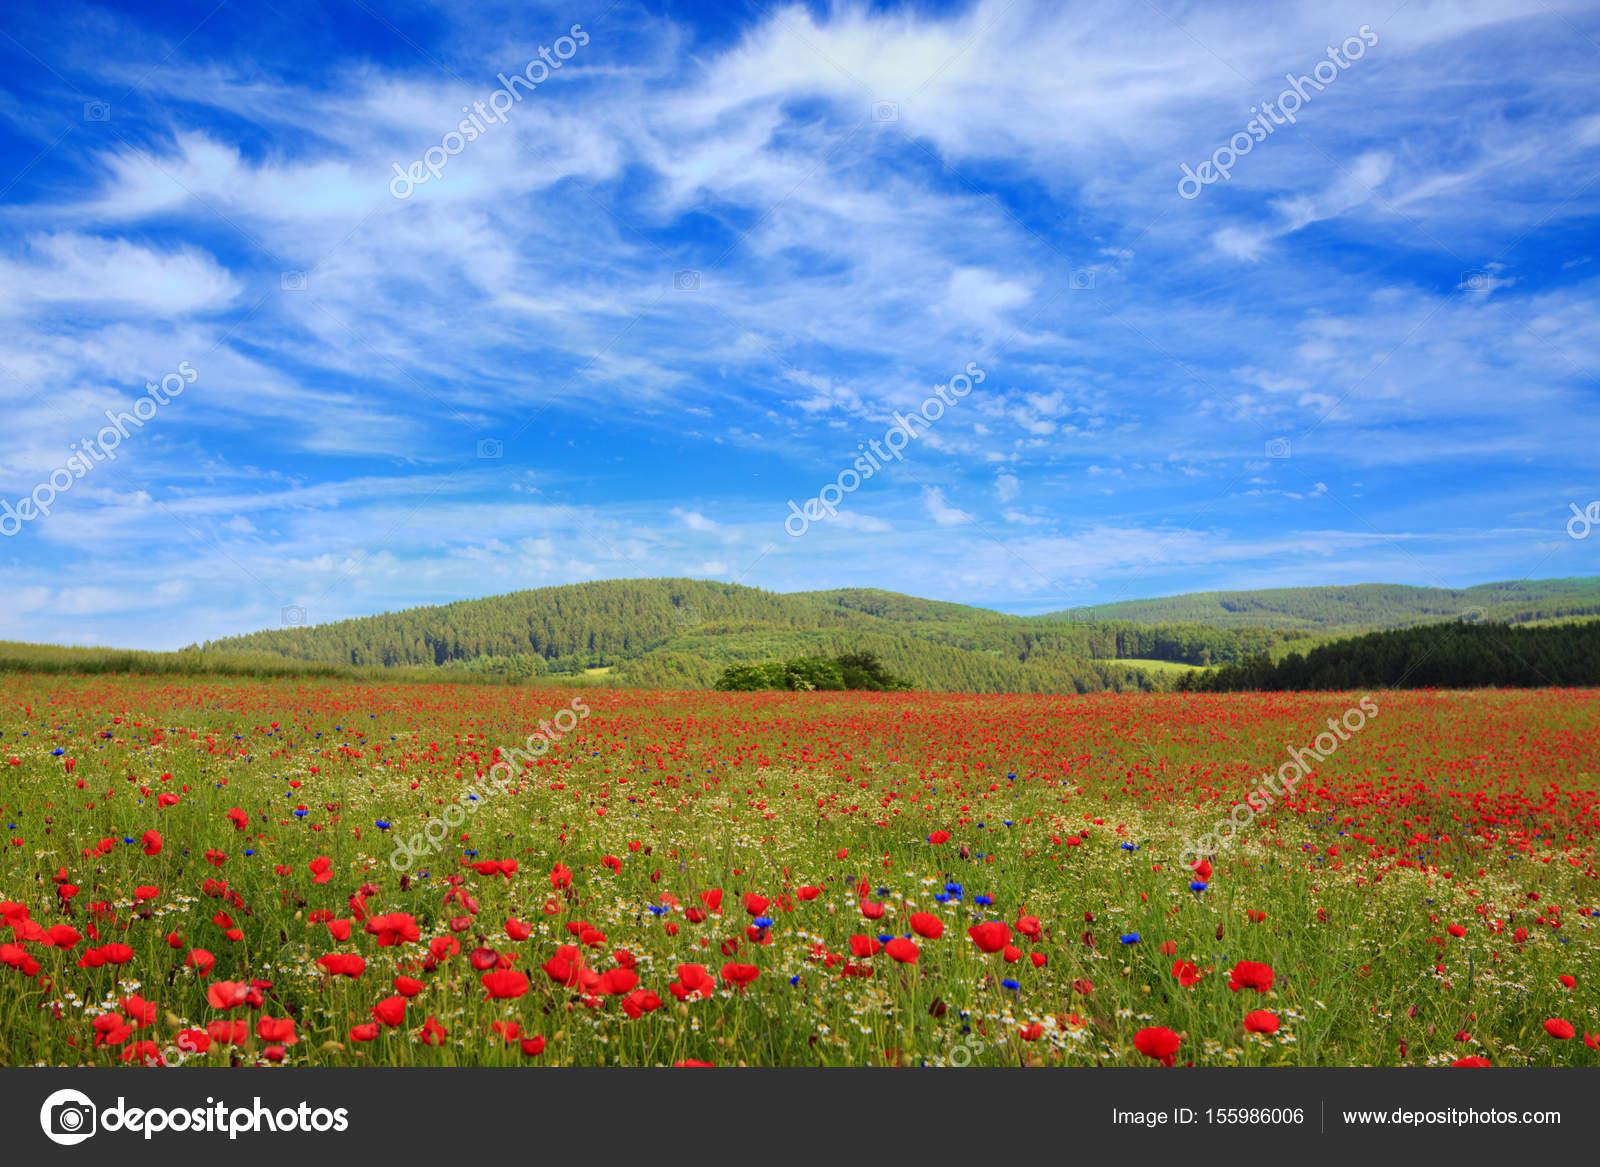 Wild Poppy Flowers On Blue Sky Background Stock Photo Swkunst